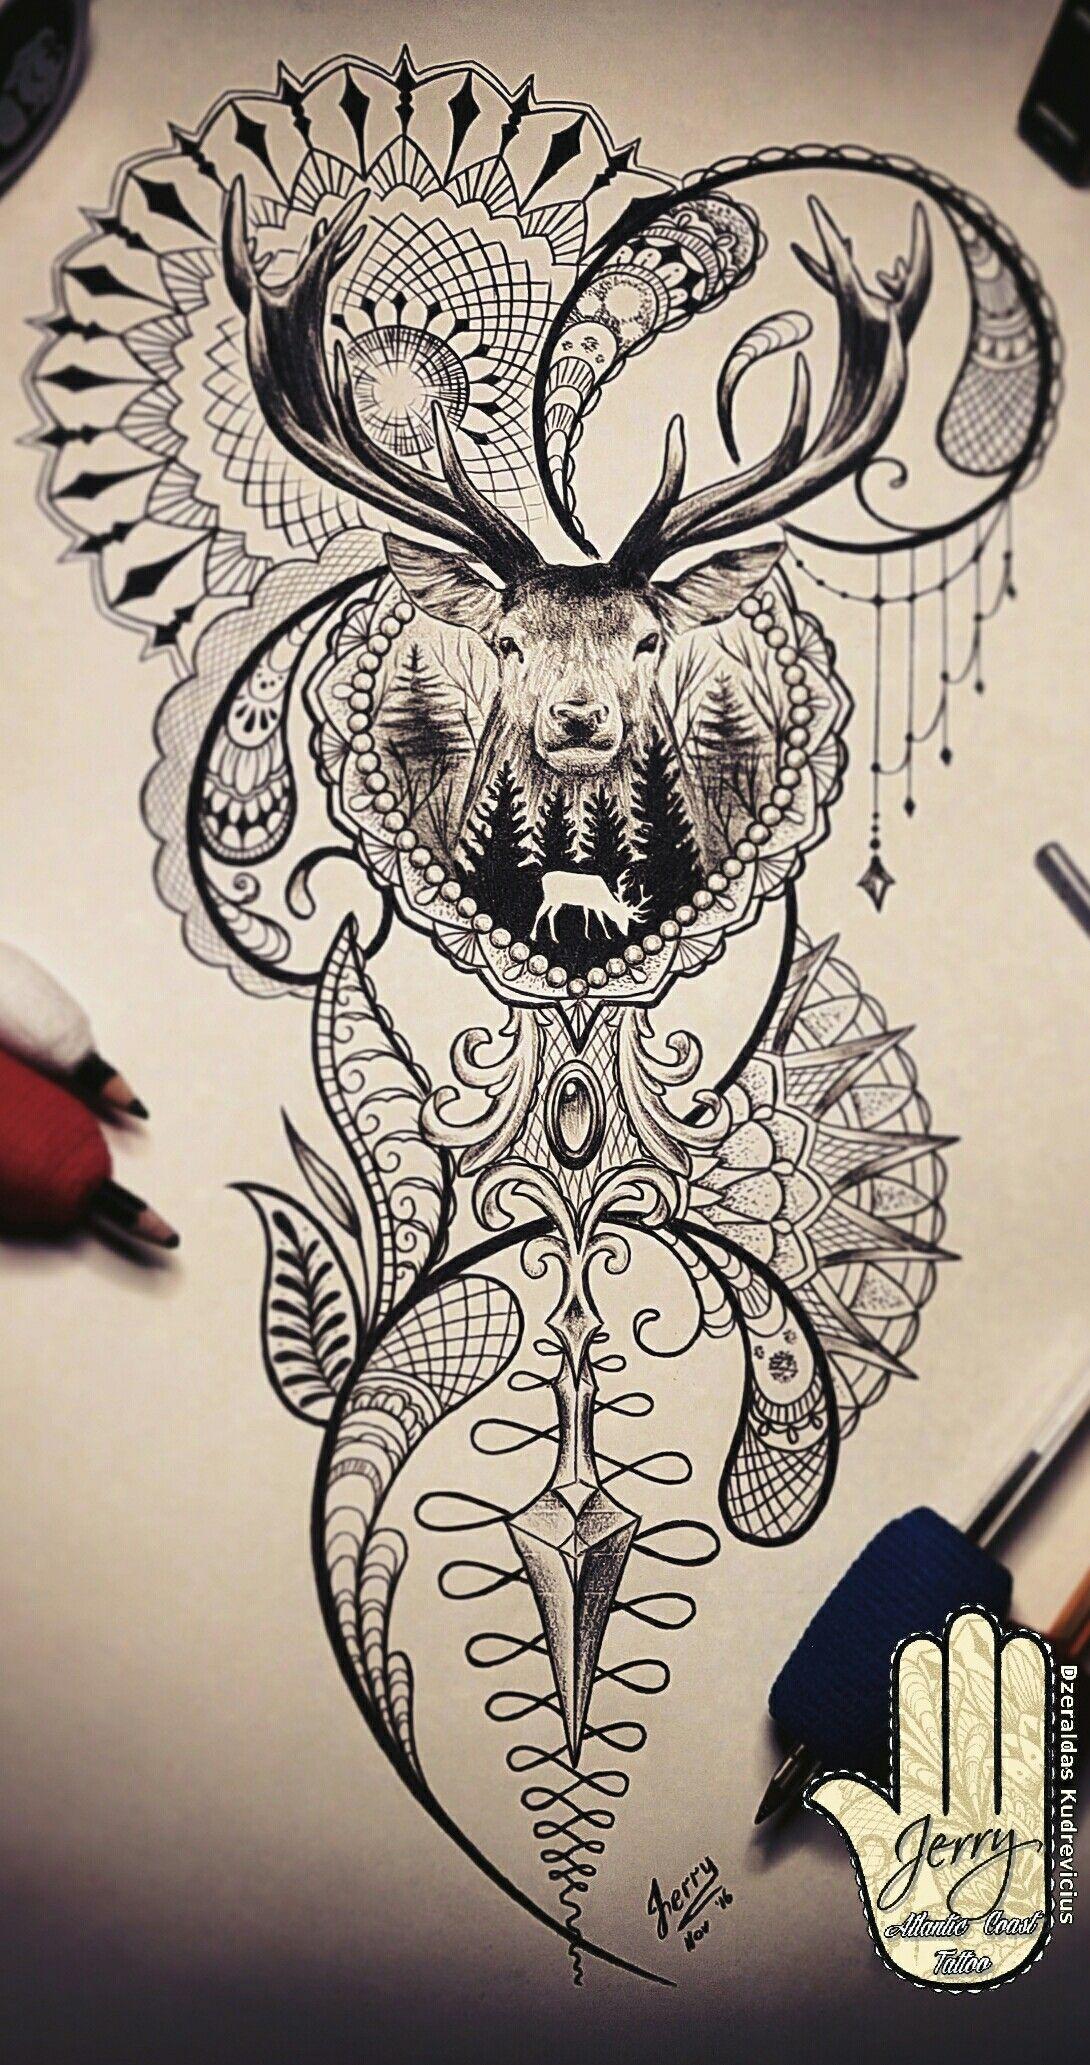 Stag Tattoo Design Idea Dear Stag Tattoo Design Stag